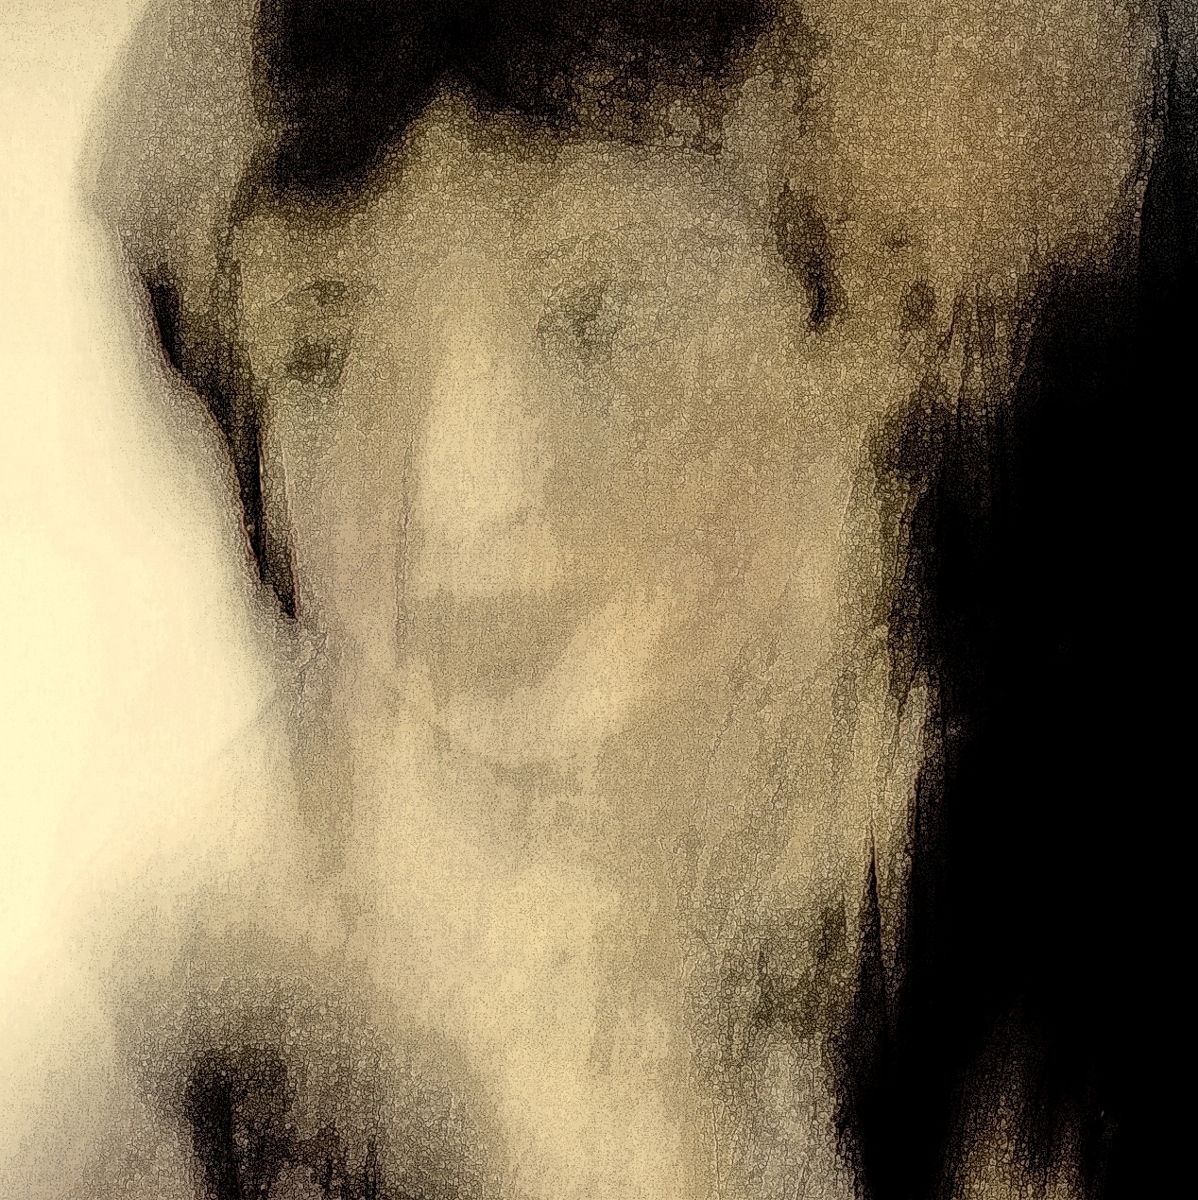 Etherial portrait (large view)